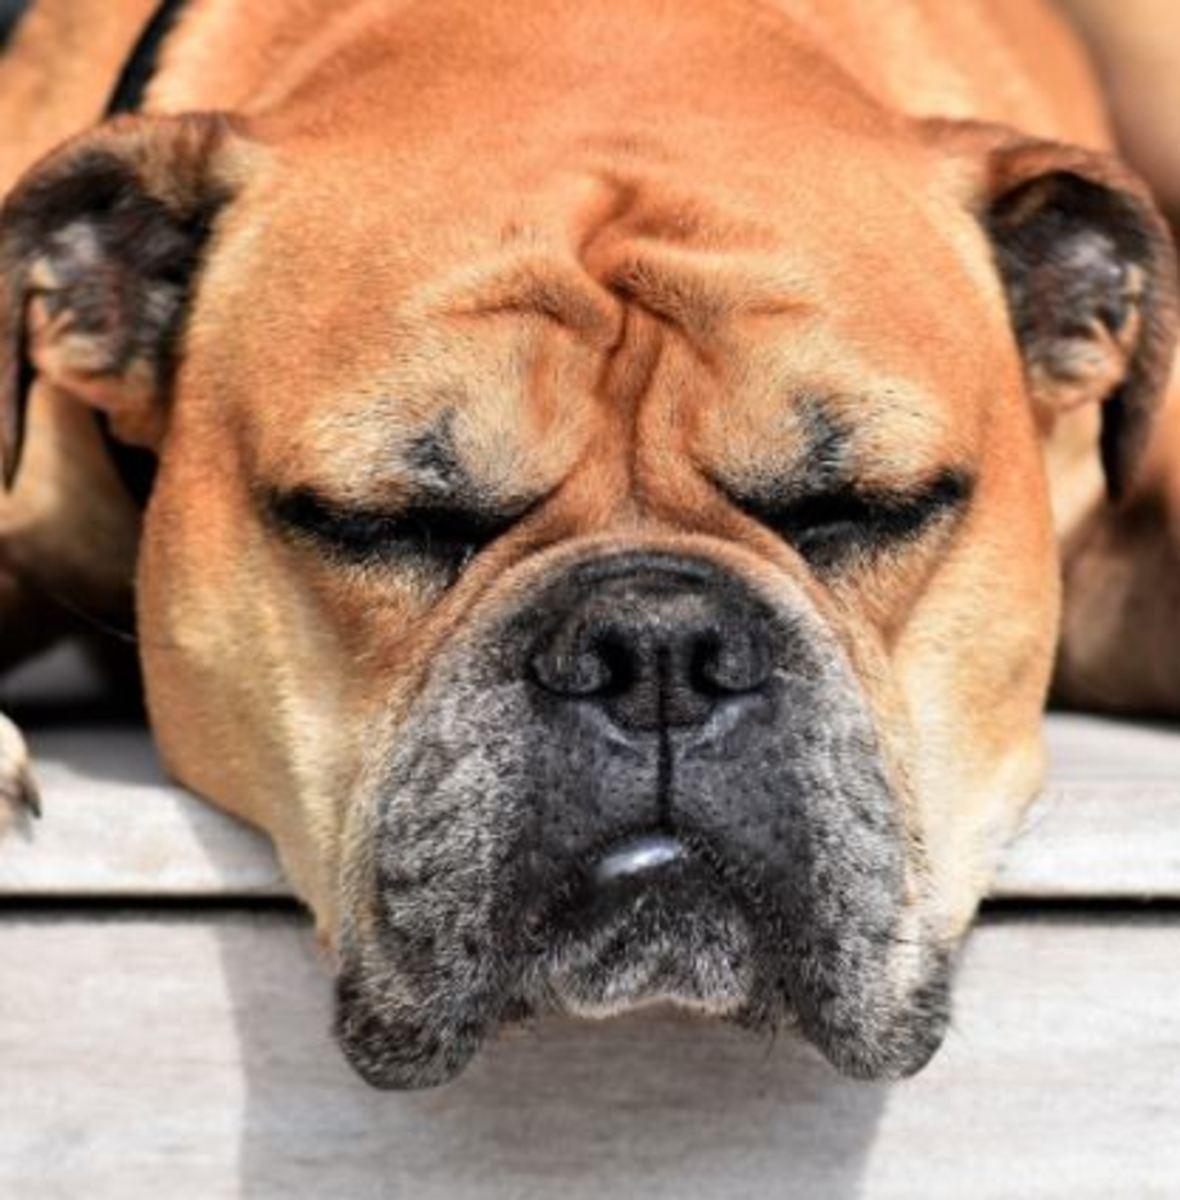 Styes on a Dog's Eyelids Remedies